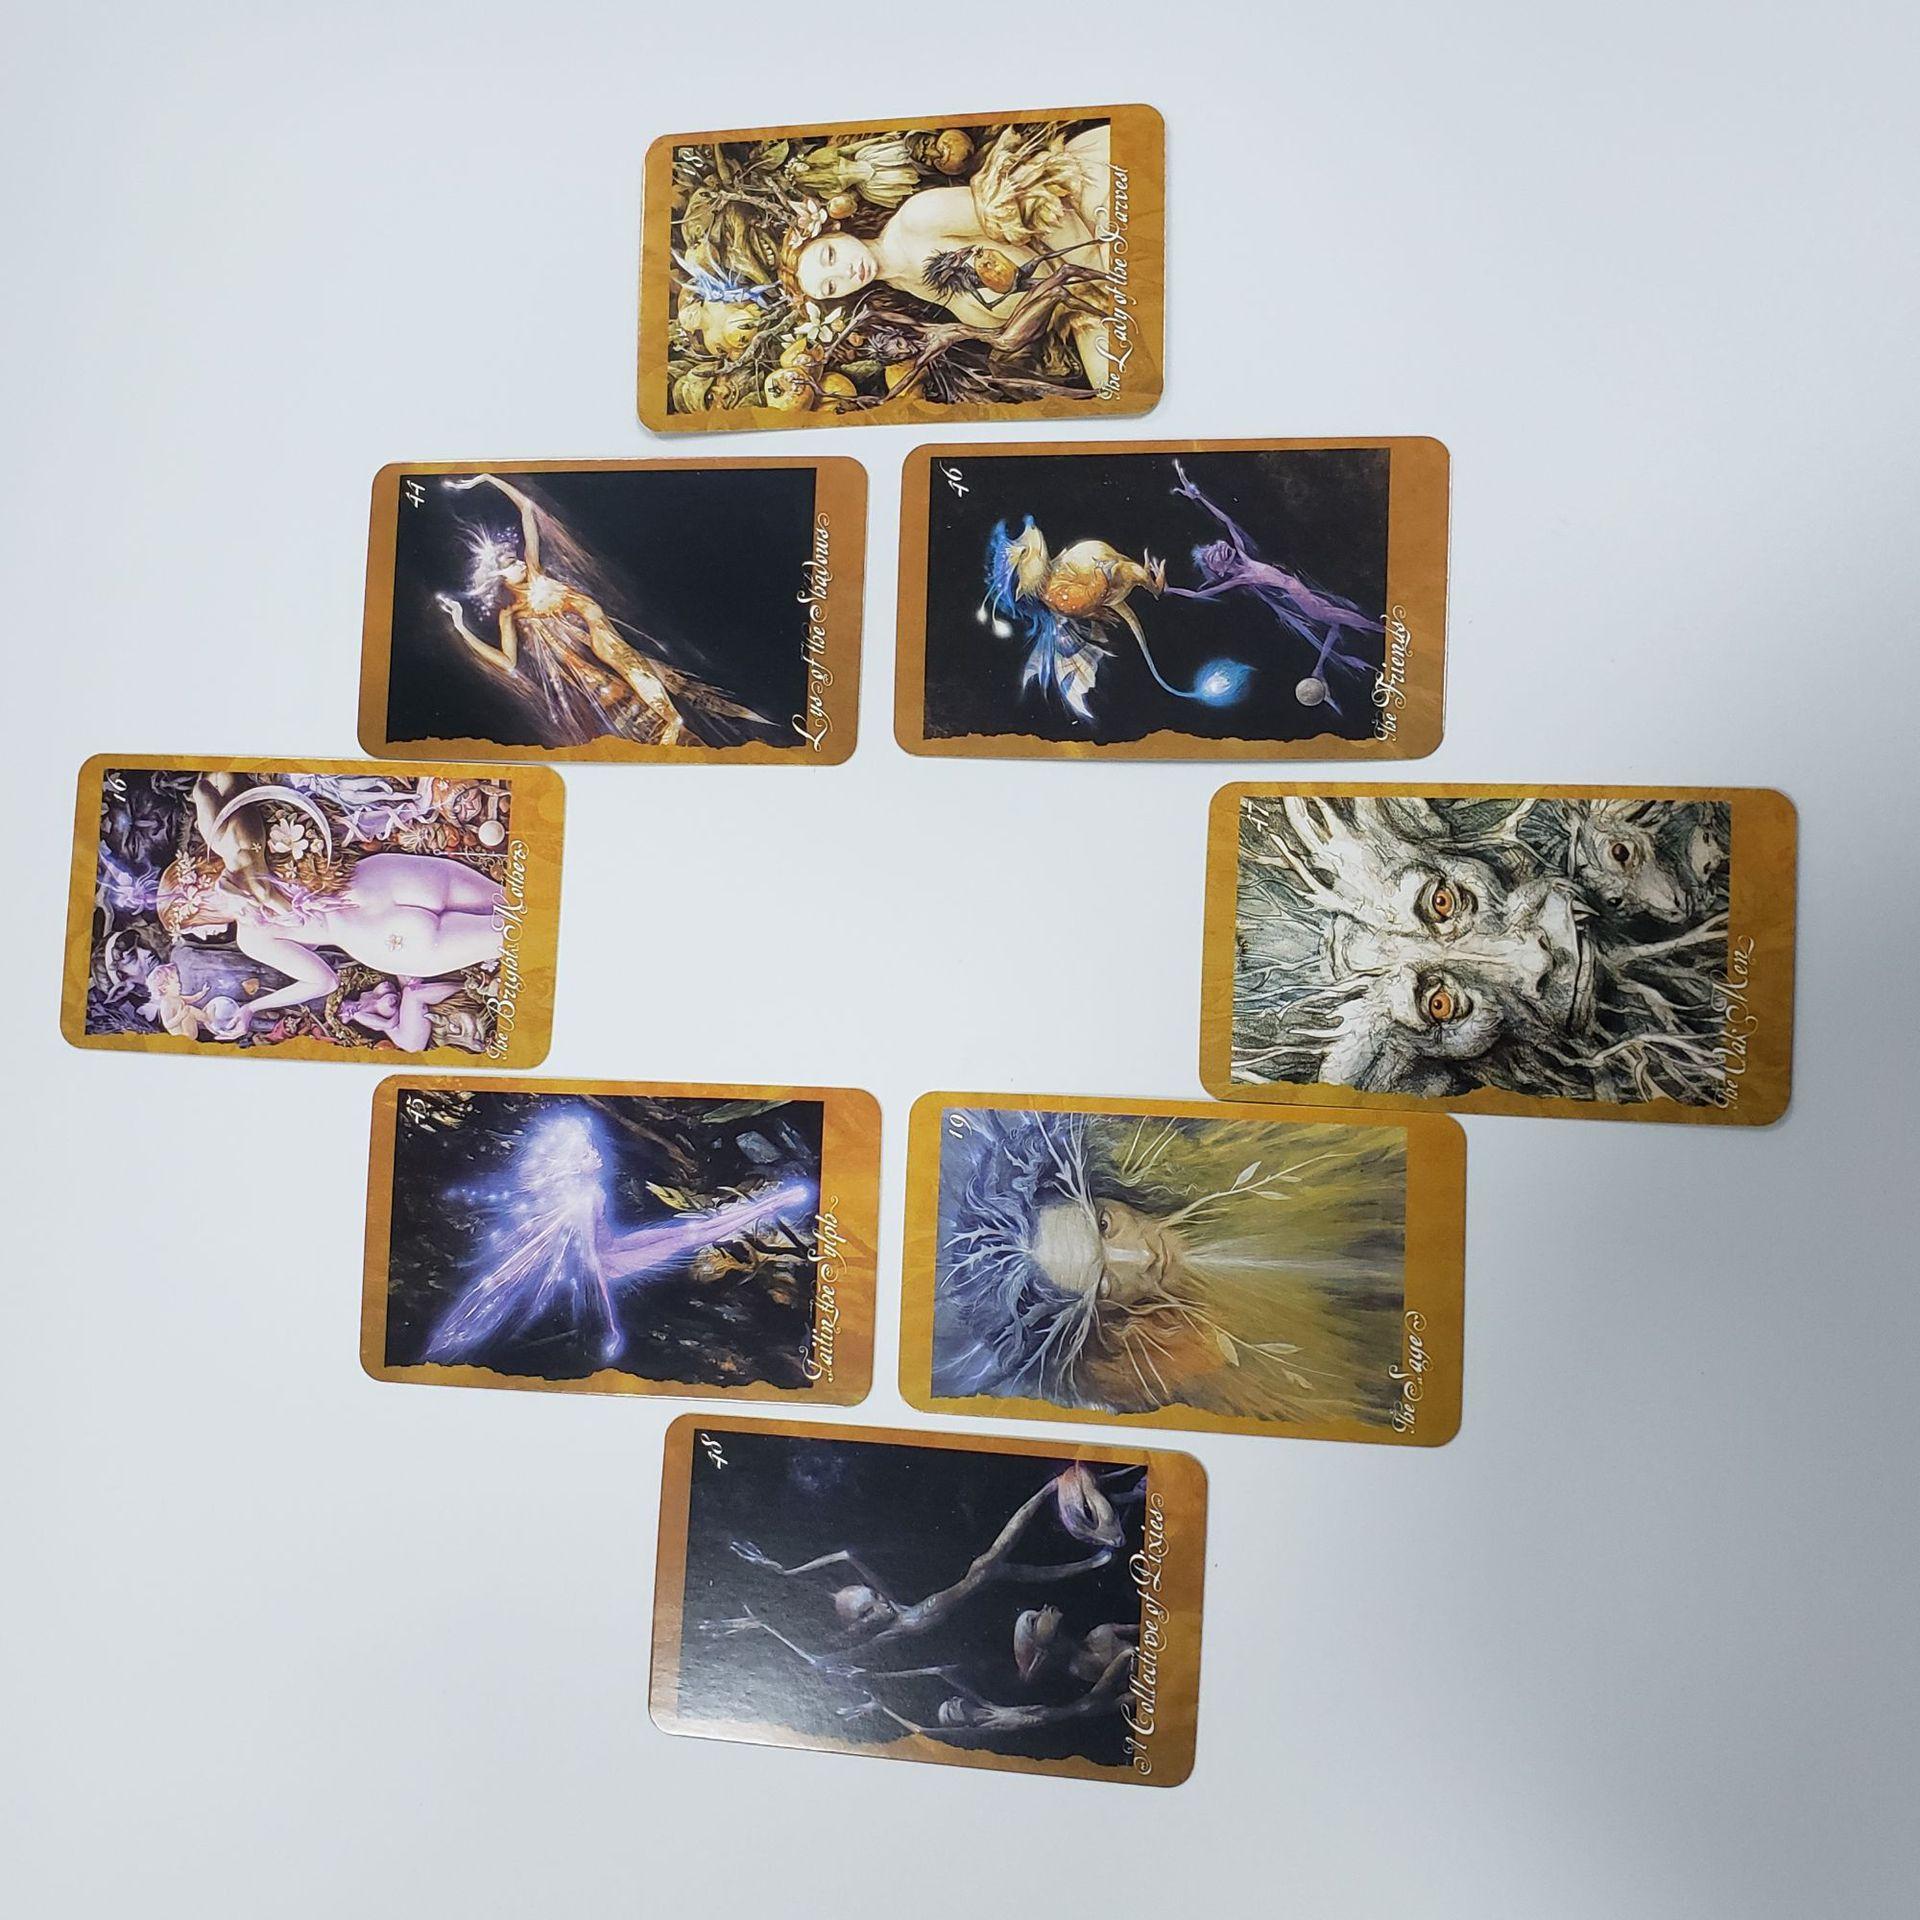 Bộ Bài Bói Tarot The Faeries Oracle Deck Cao Cấp Đẹp